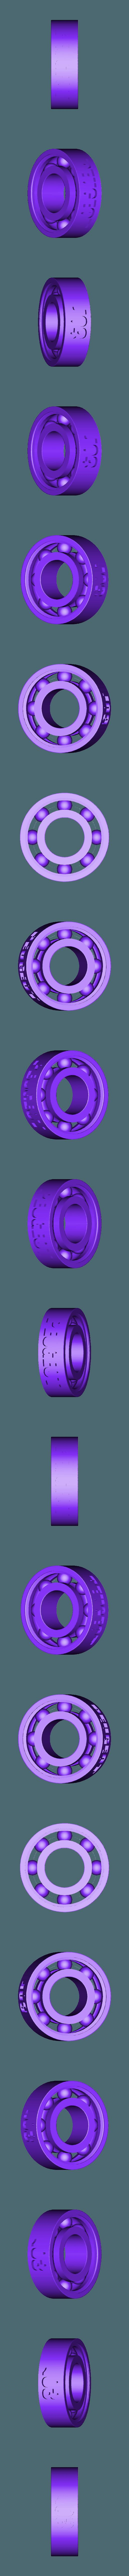 103 BILLE 1.stl Download free STL file False Peugeot 103 bearing • 3D printing template, Ours3DPrinting